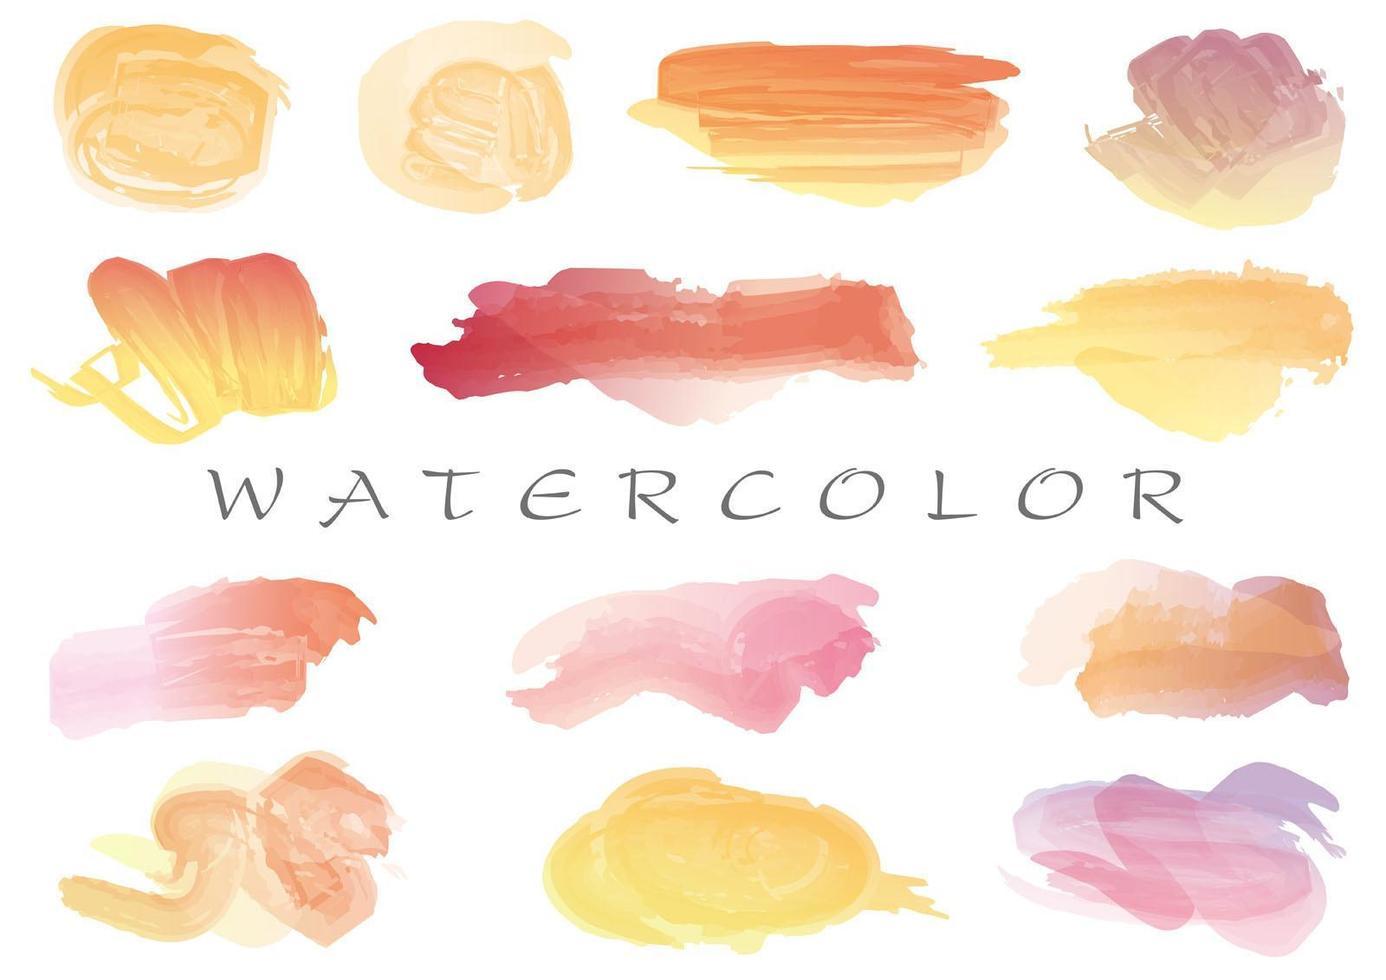 Watercolor brush stroke icon collection  vector